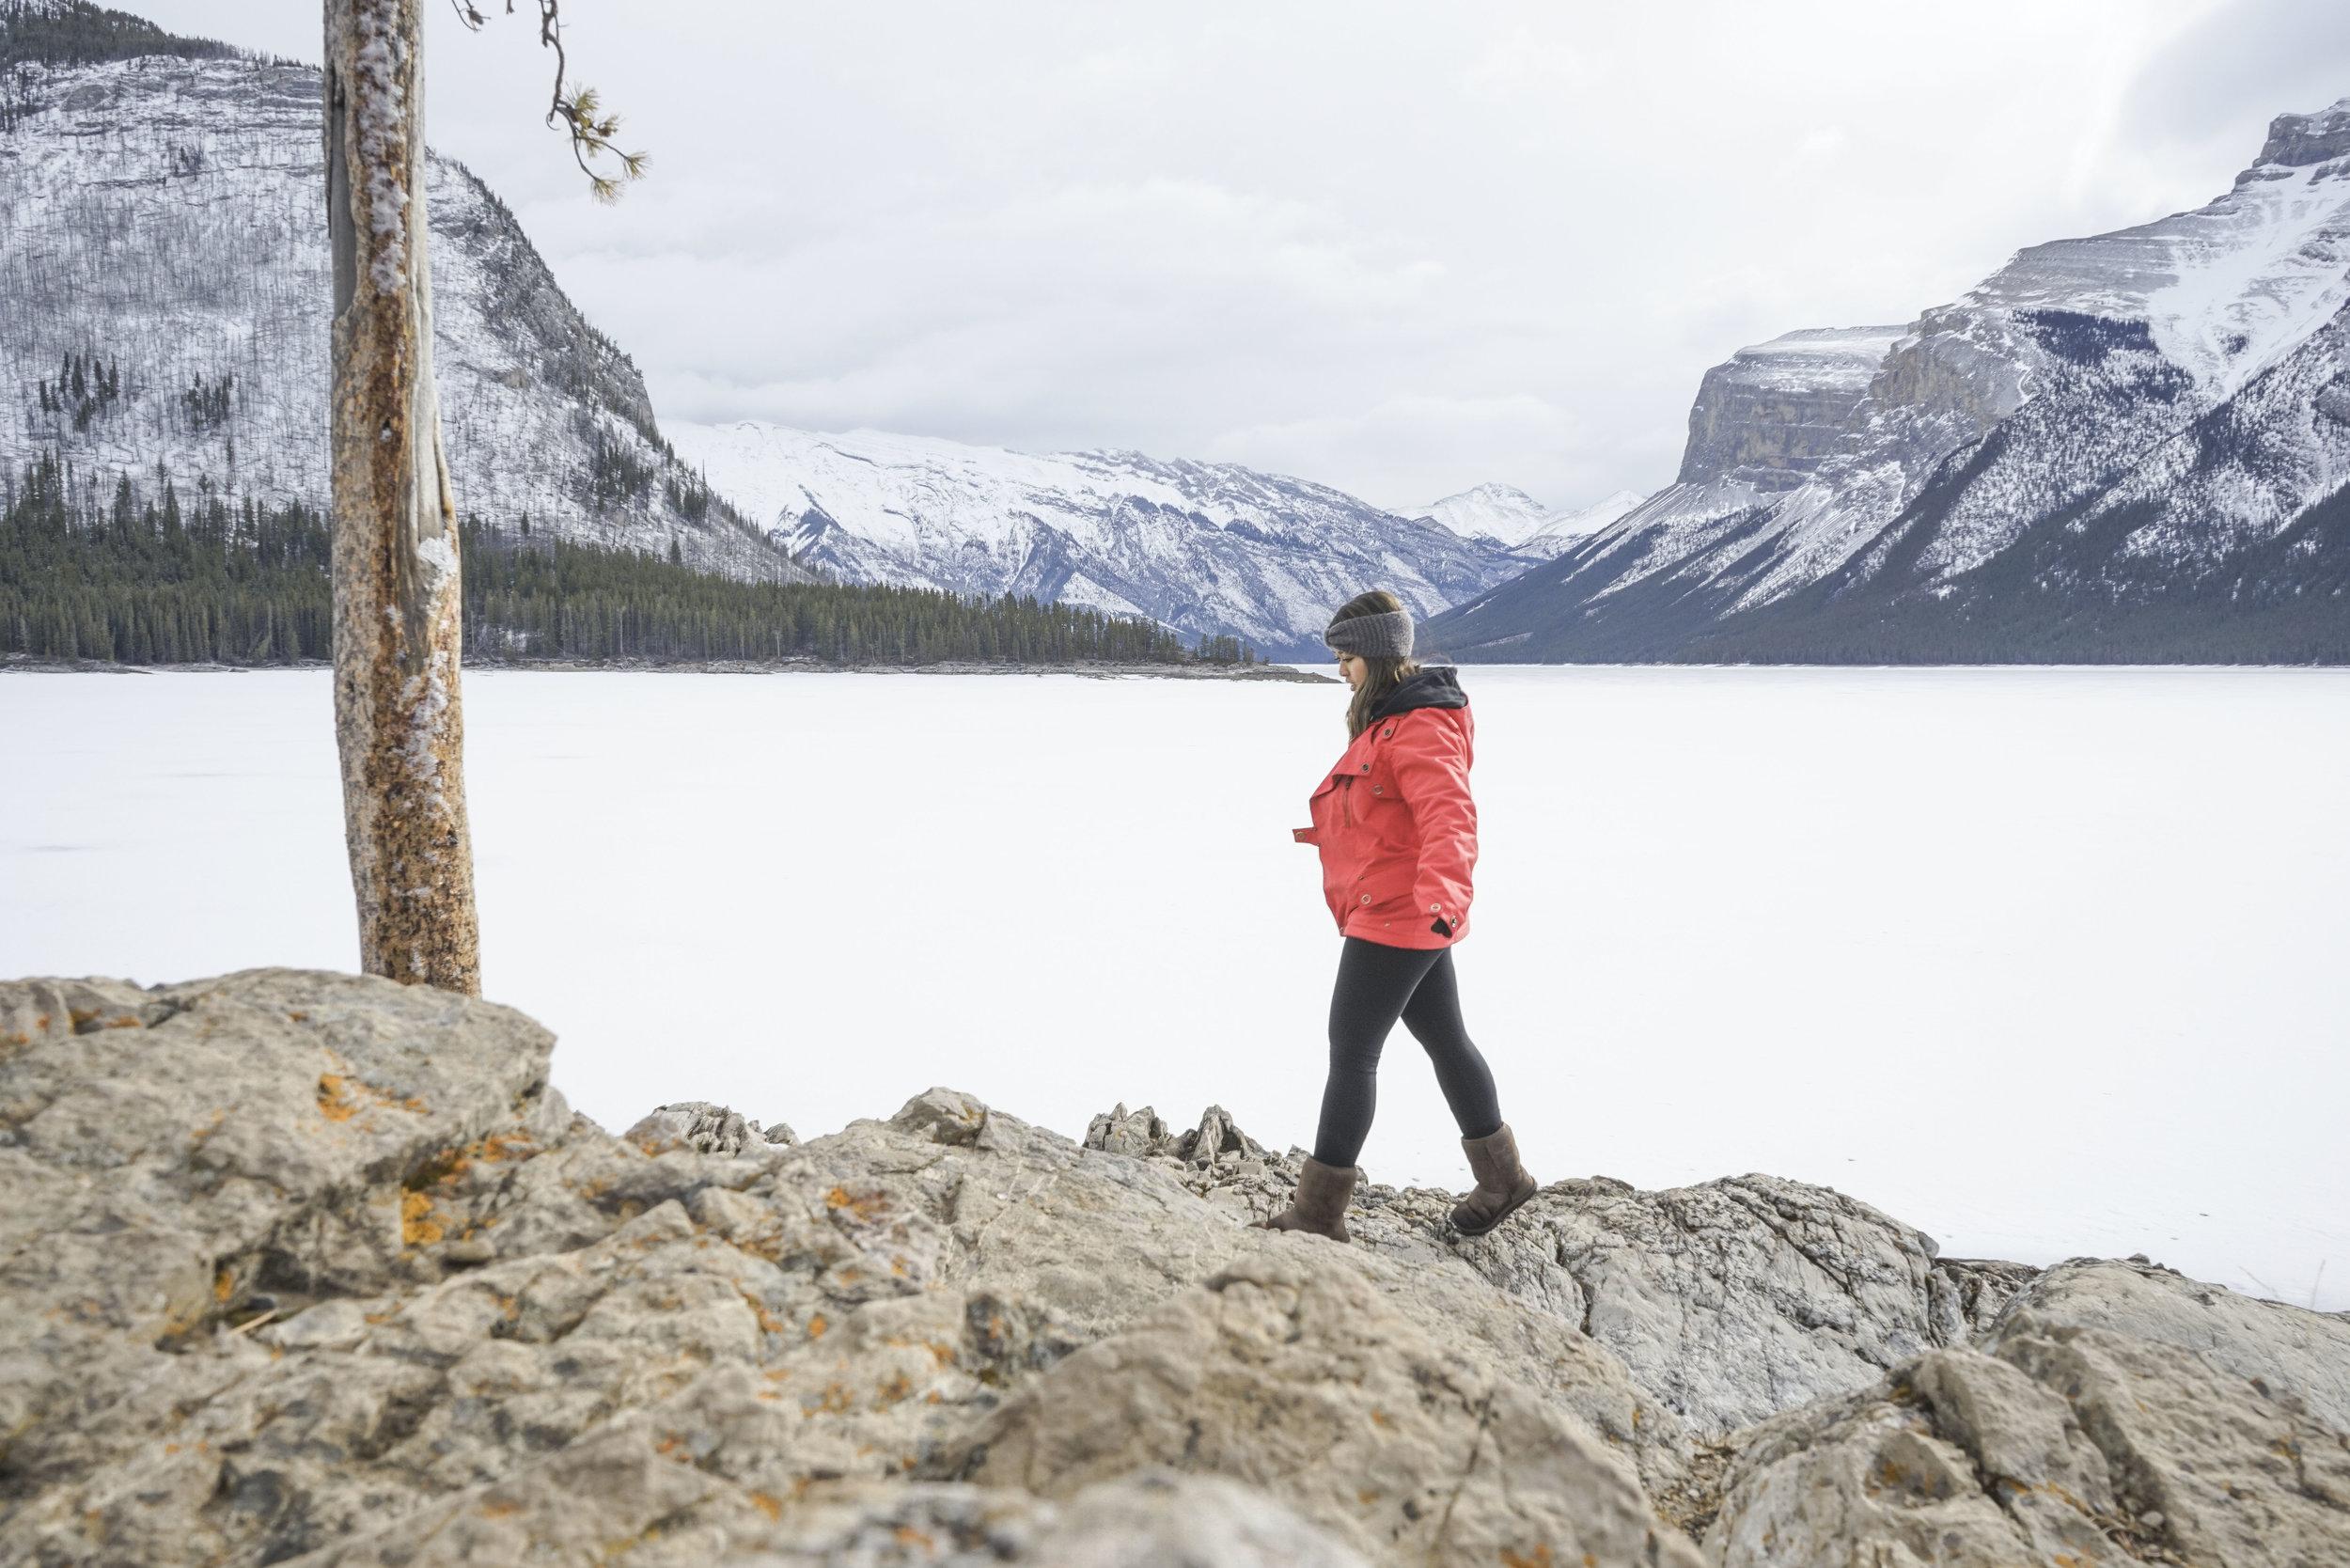 The beautiful Banff, Alberta in winter